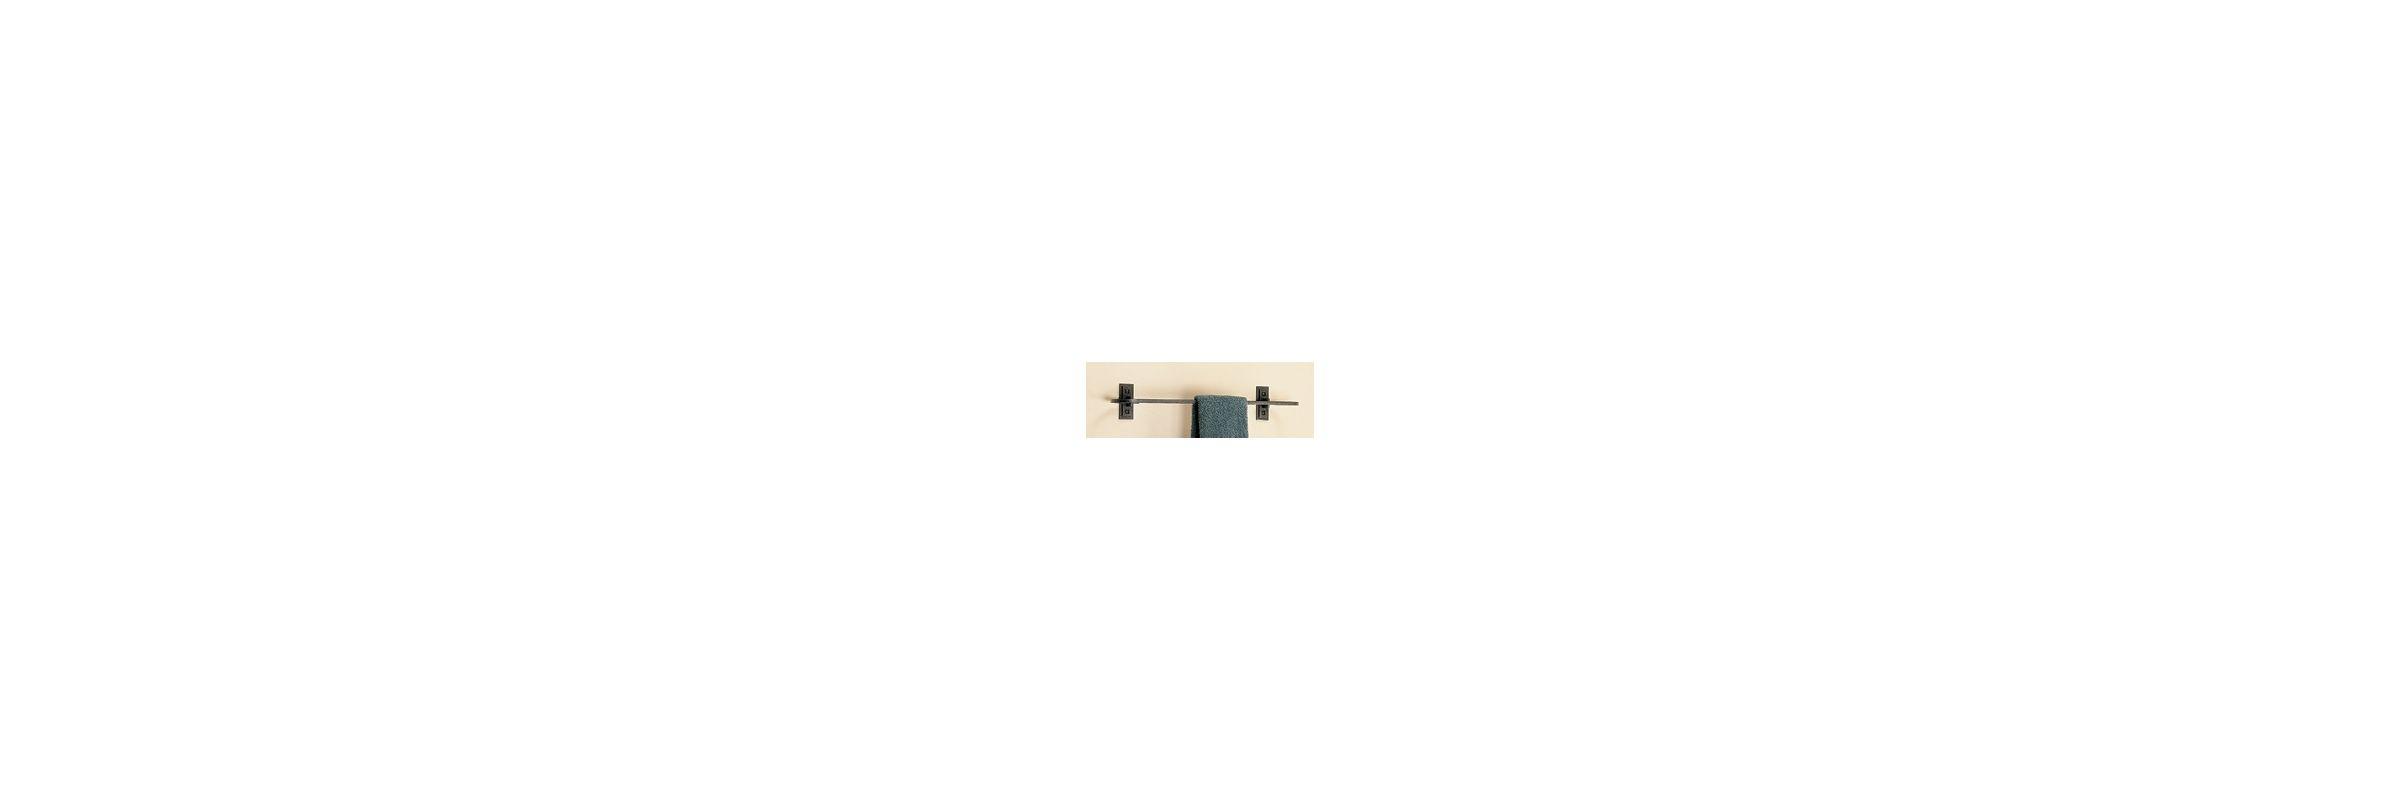 "Hubbardton Forge 841016 21"" Metra Curved Towel Bar Natural Iron"